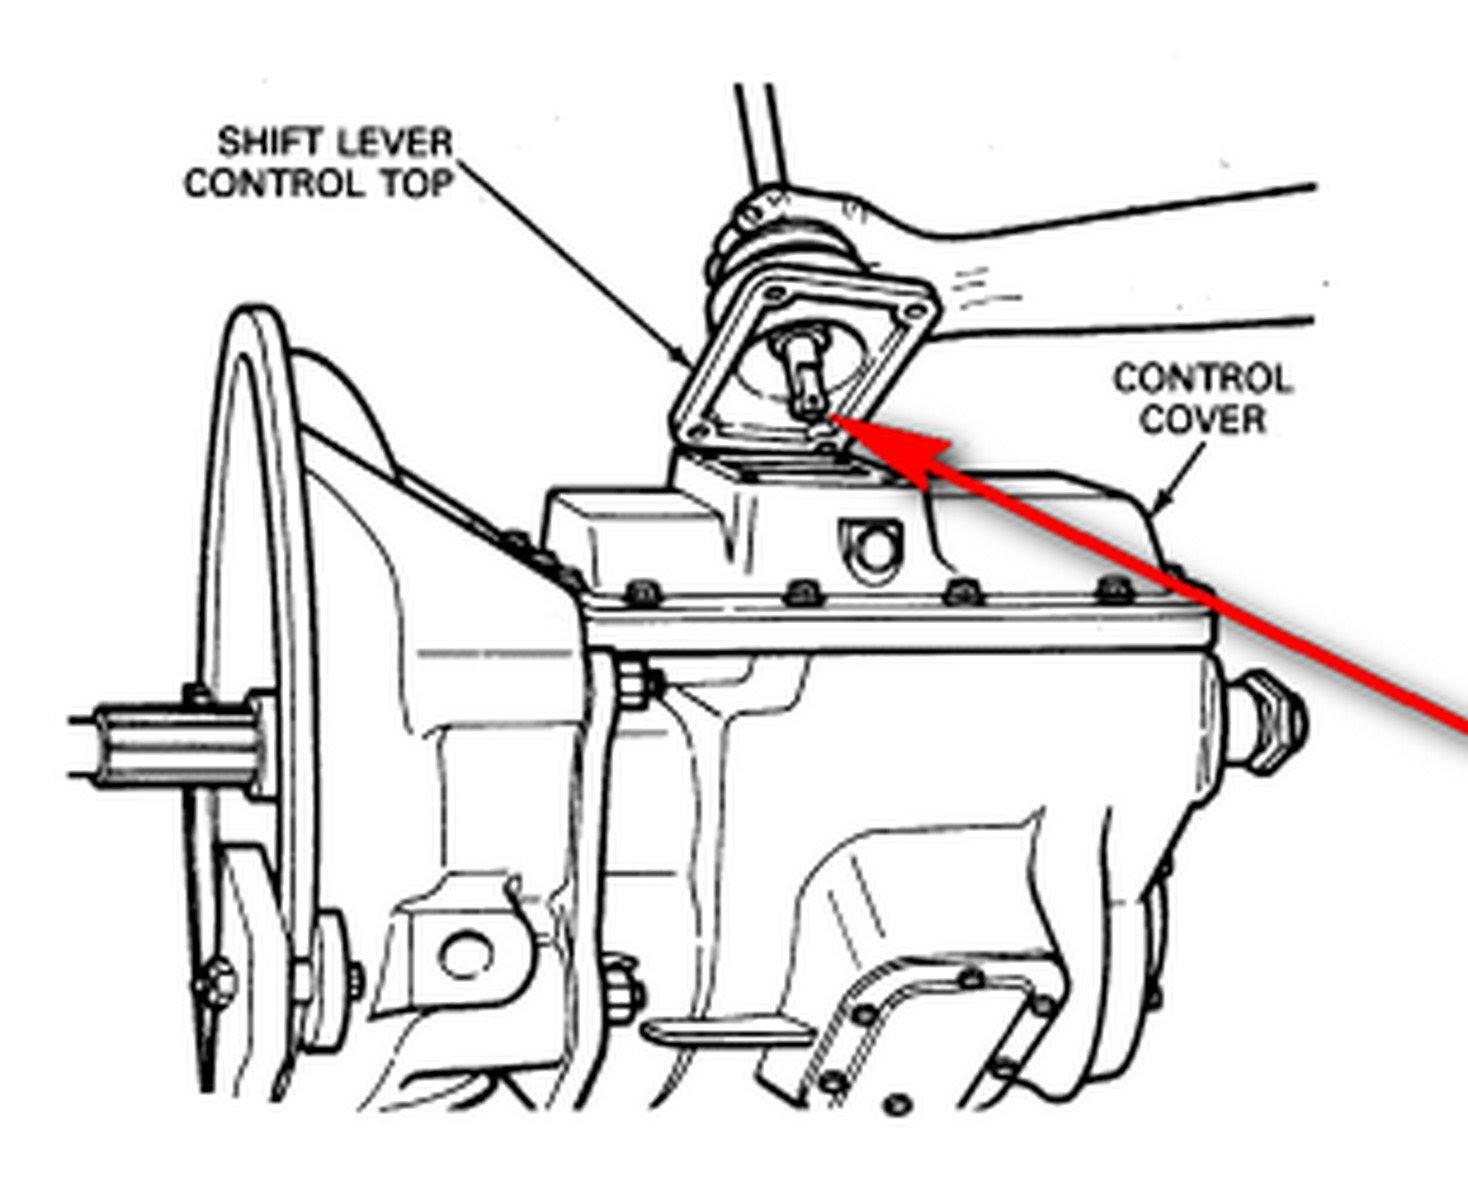 F150 Transmission Schematic Wiring Diagram Extend B Extend B Reteimpresesabina It